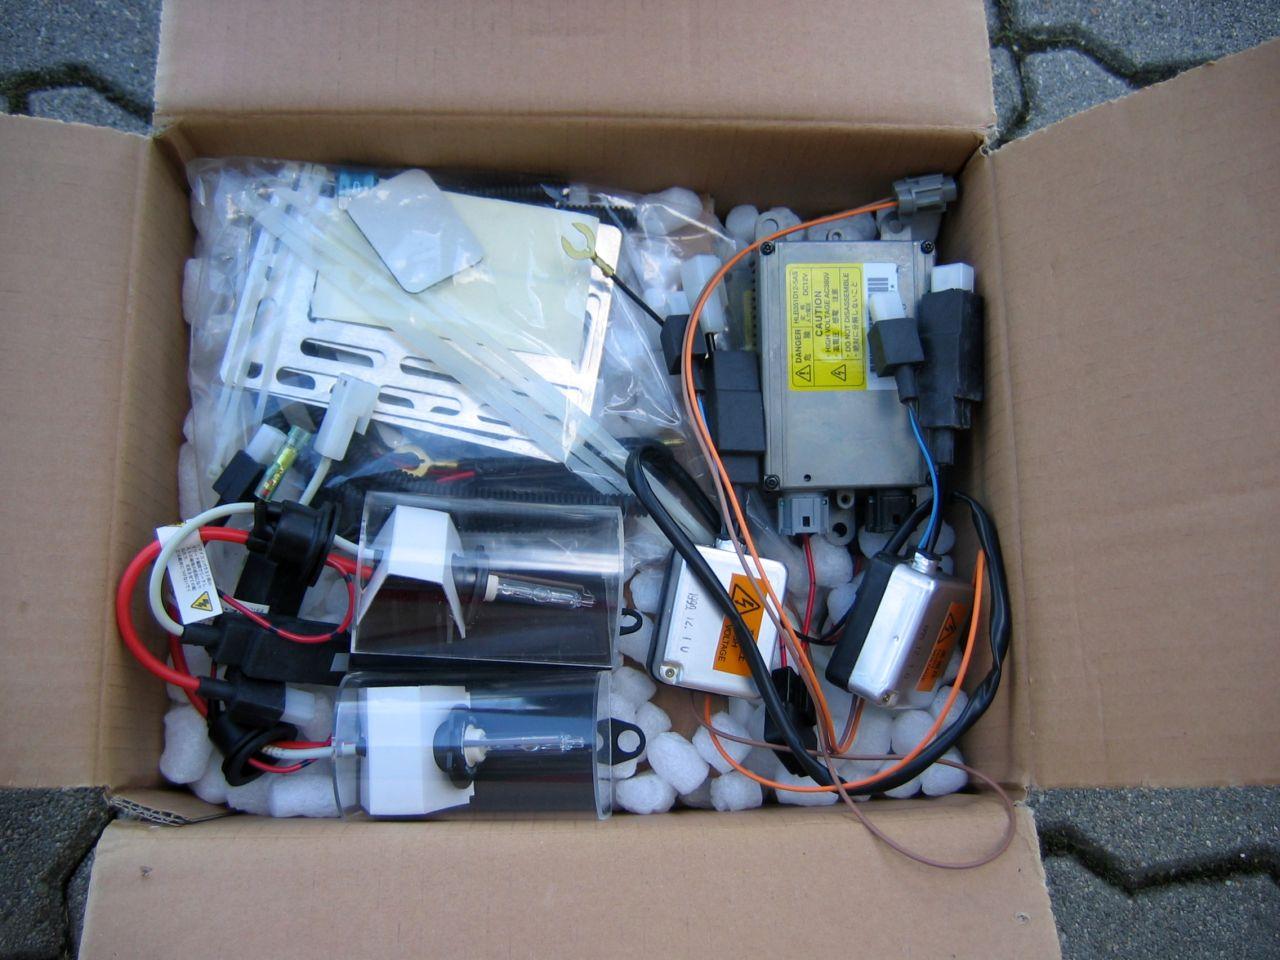 Fs Brabus Hid Kit Complete New-mb-cd-021.jpg